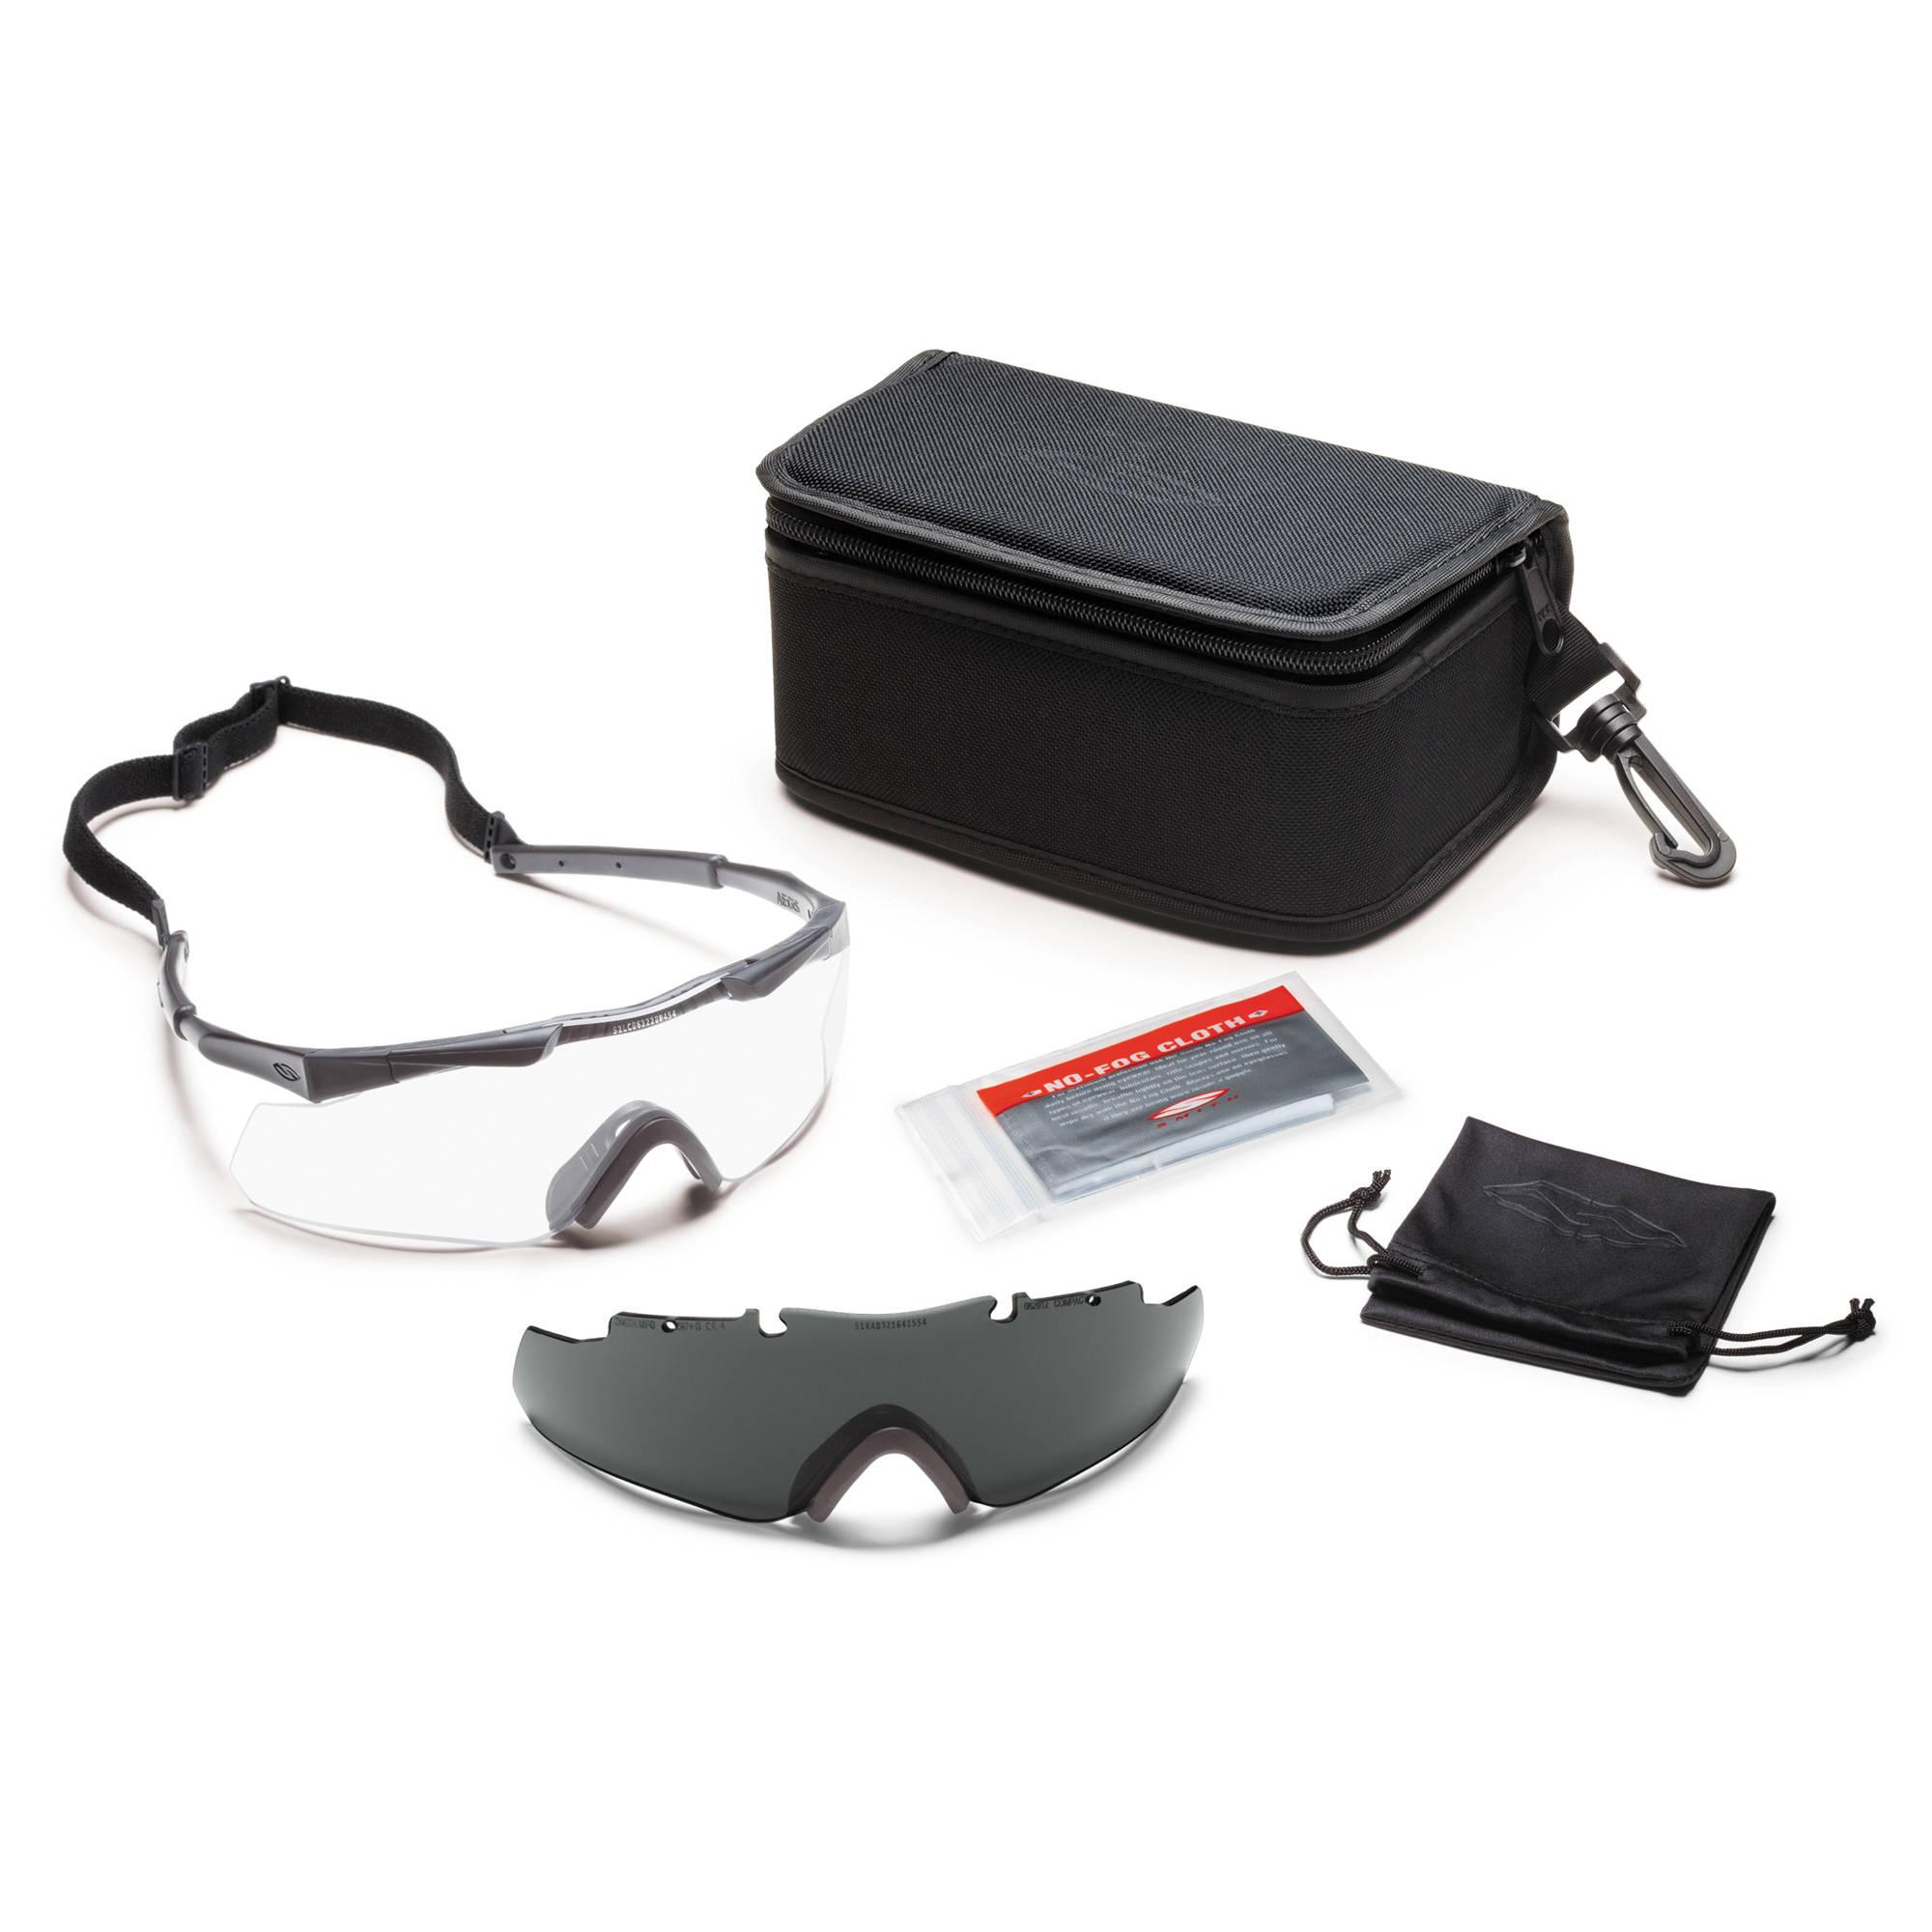 5f4eec9ab4 Smith Optics Aegis Arc Compact Protective Eyewear - Field Kit (Urban Wolf  Gray)